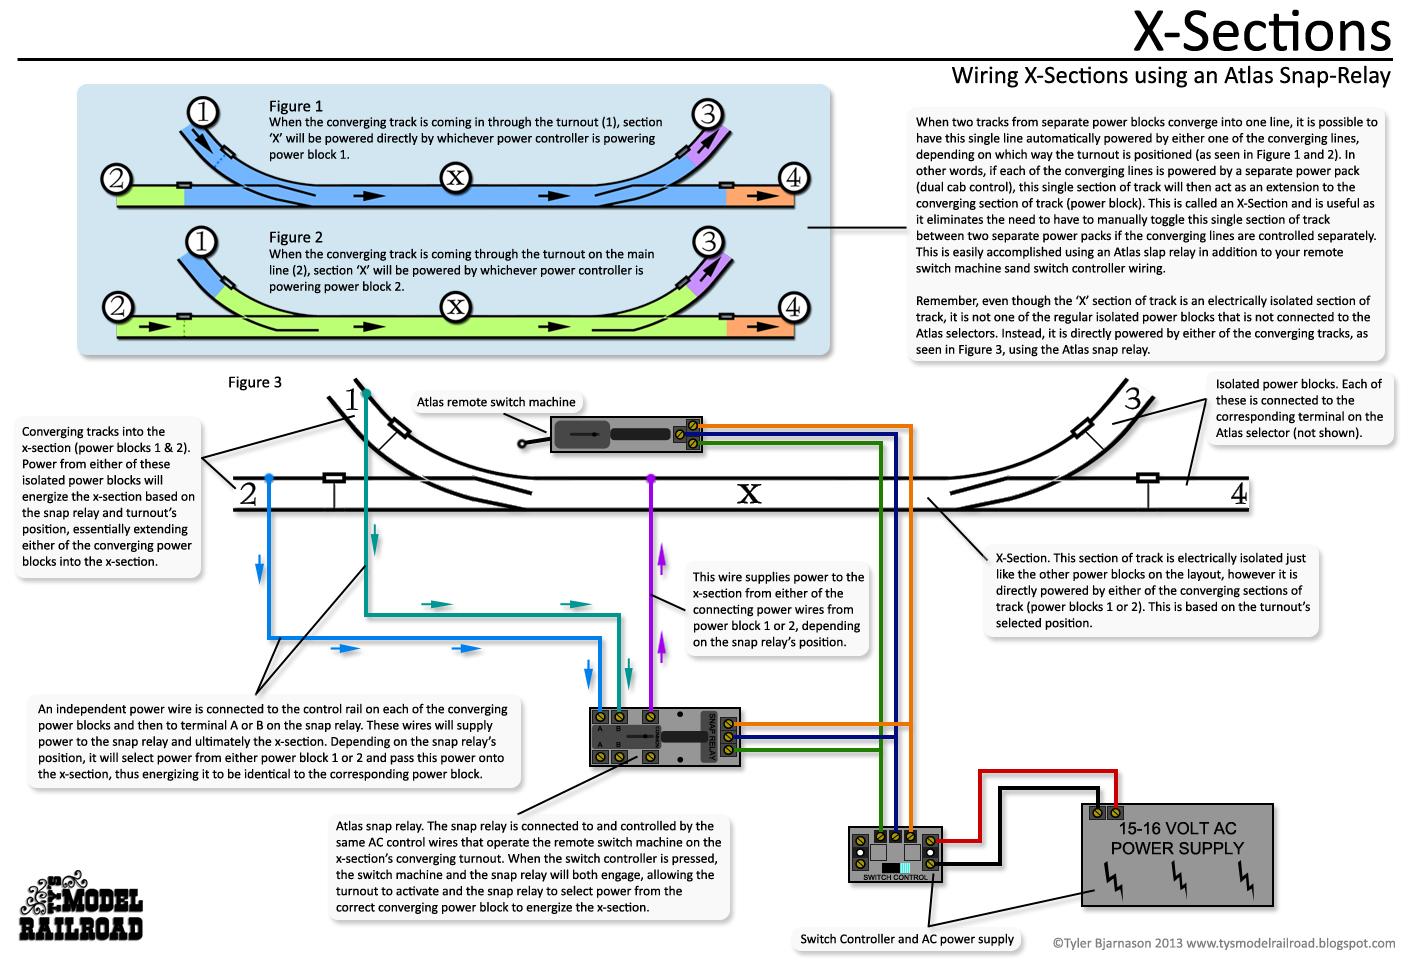 TY'S MODEL RAILROAD: Wiring Diagrams